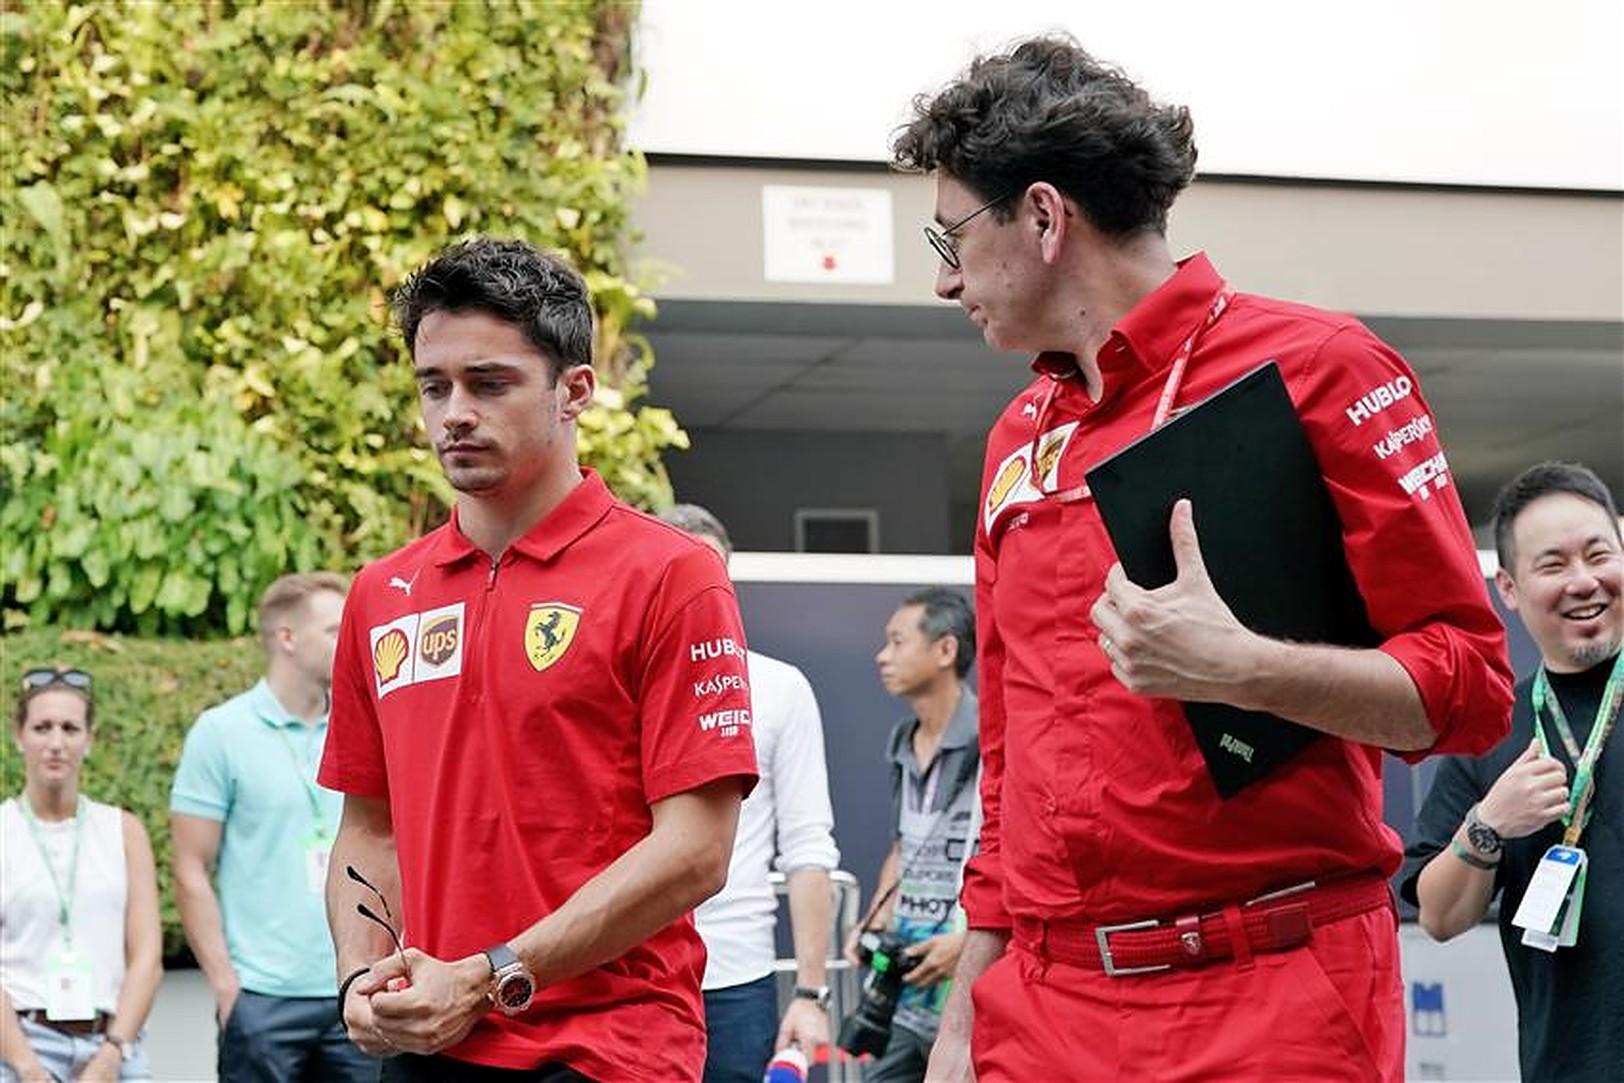 Charles Leclerc and Mattia Binotto could leave Ferrari - Formula1News.co.uk